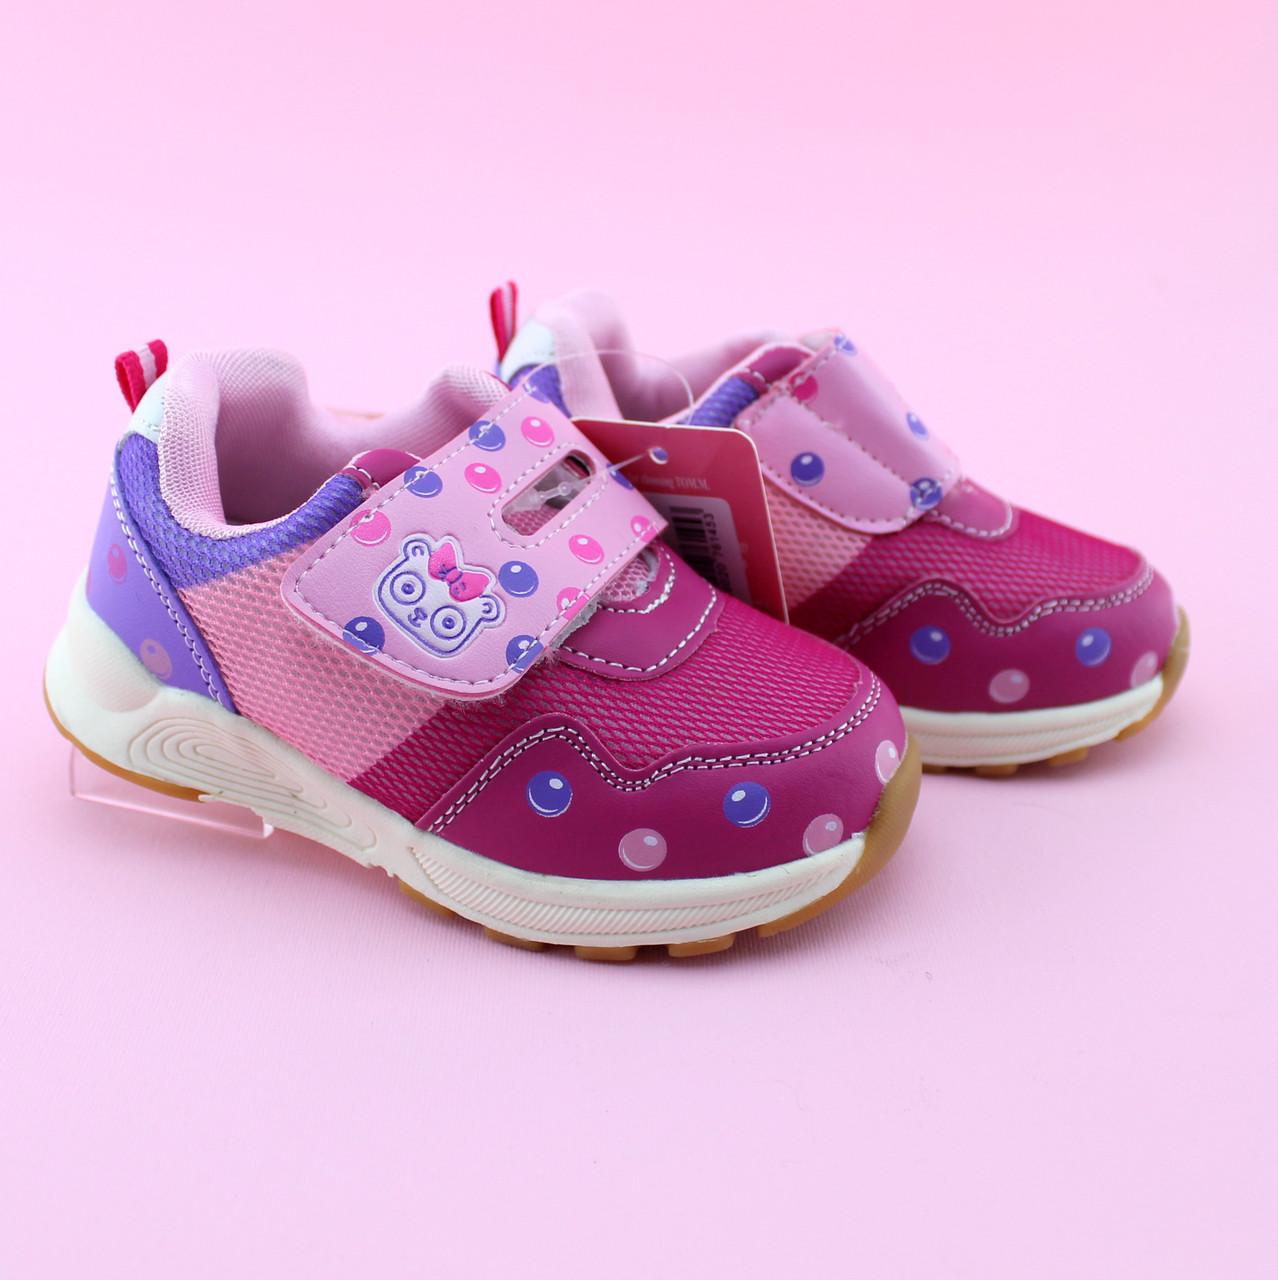 Детские кроссовки на девочку Горошки тм Том.м размер 21,22,23